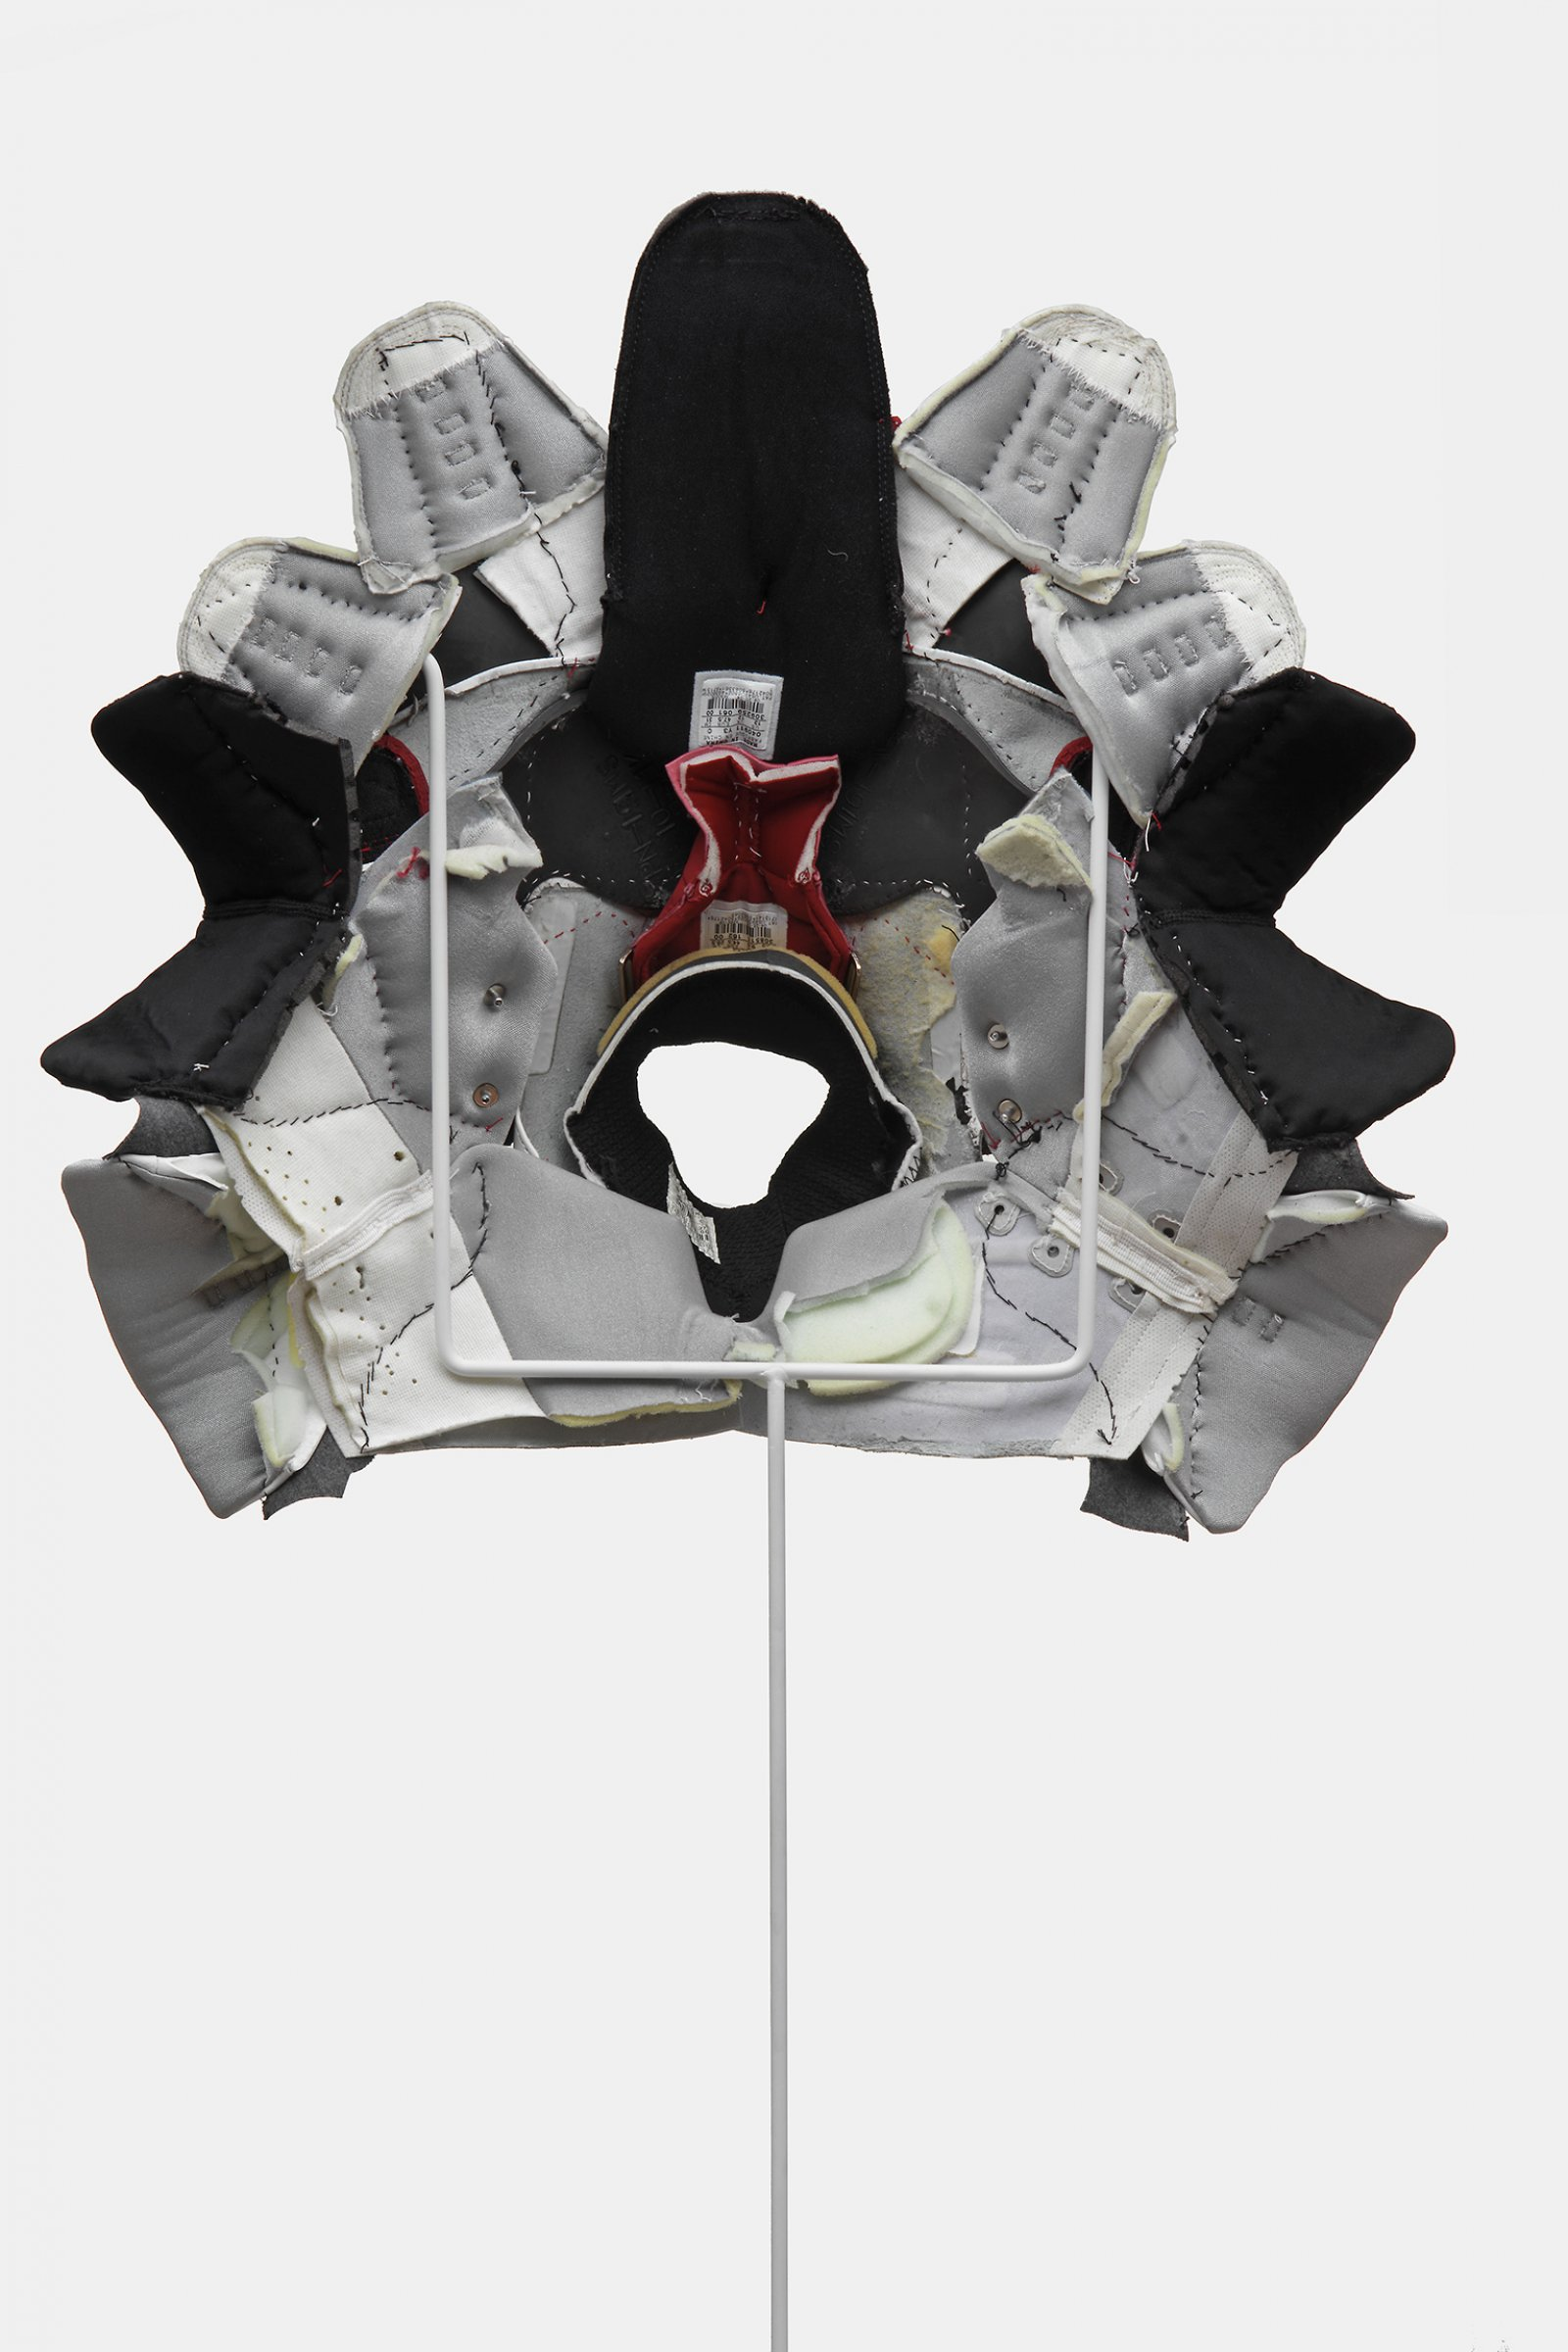 BrianJungen,Prototype for New Understanding #23, 2005, nike air jordans, human hair,19 x 20 x 6 in. (47 x 52 x 15 cm)